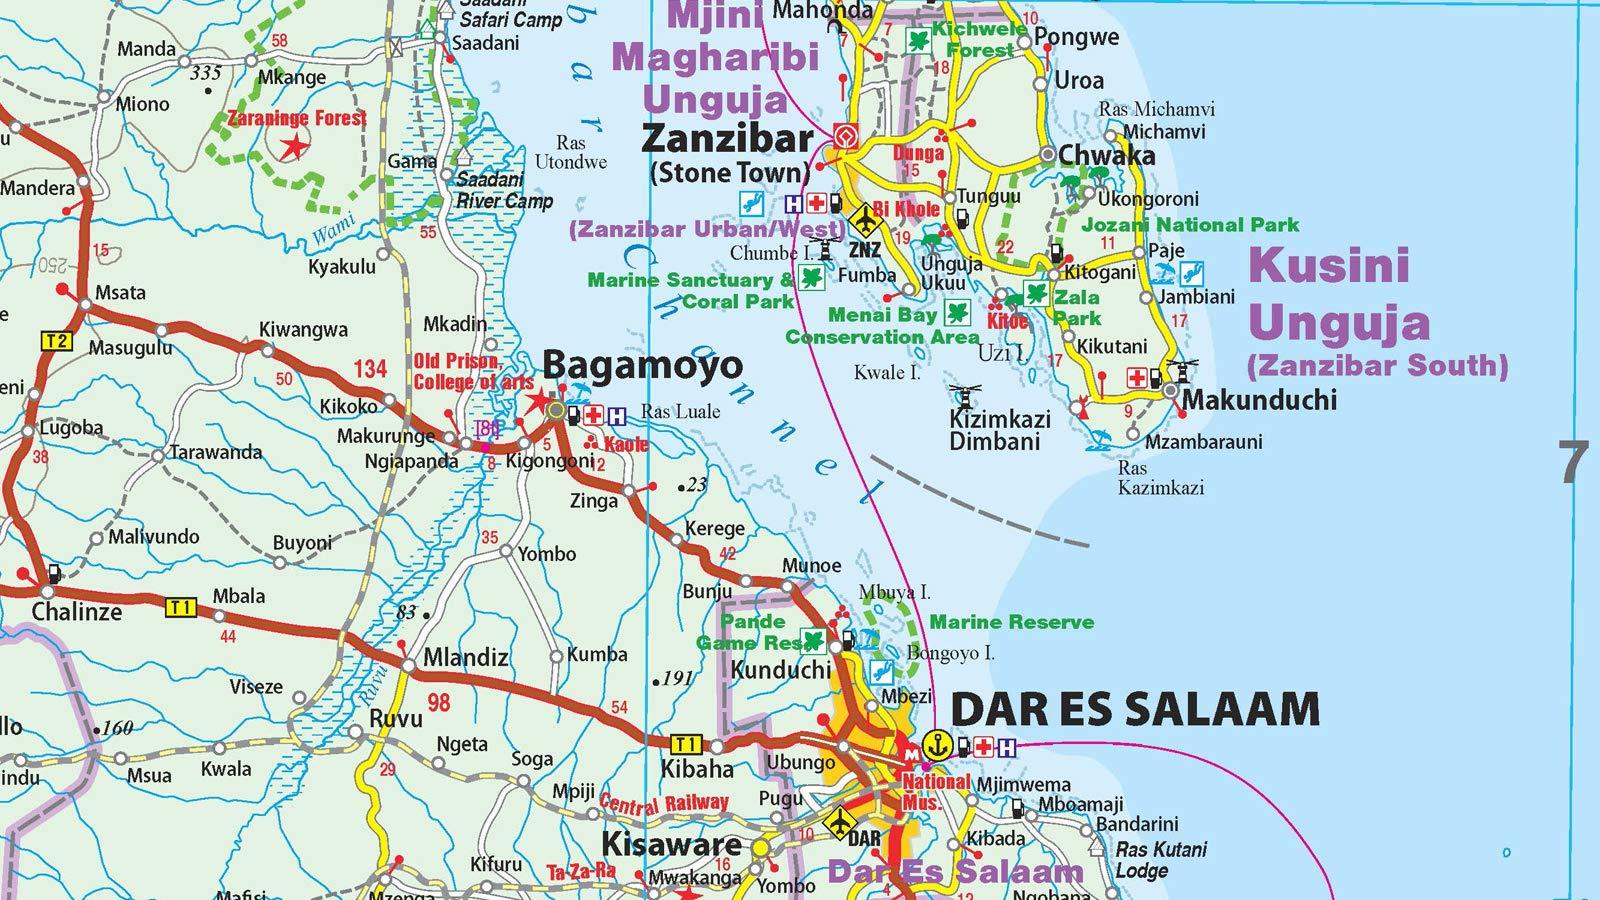 Tanzania, Ruanda, Burundi, mapa de carreteras impermeable. Escala 1:1.200.000. Reise Know-How.: world mapping project: Amazon.es: VV.AA.: Libros